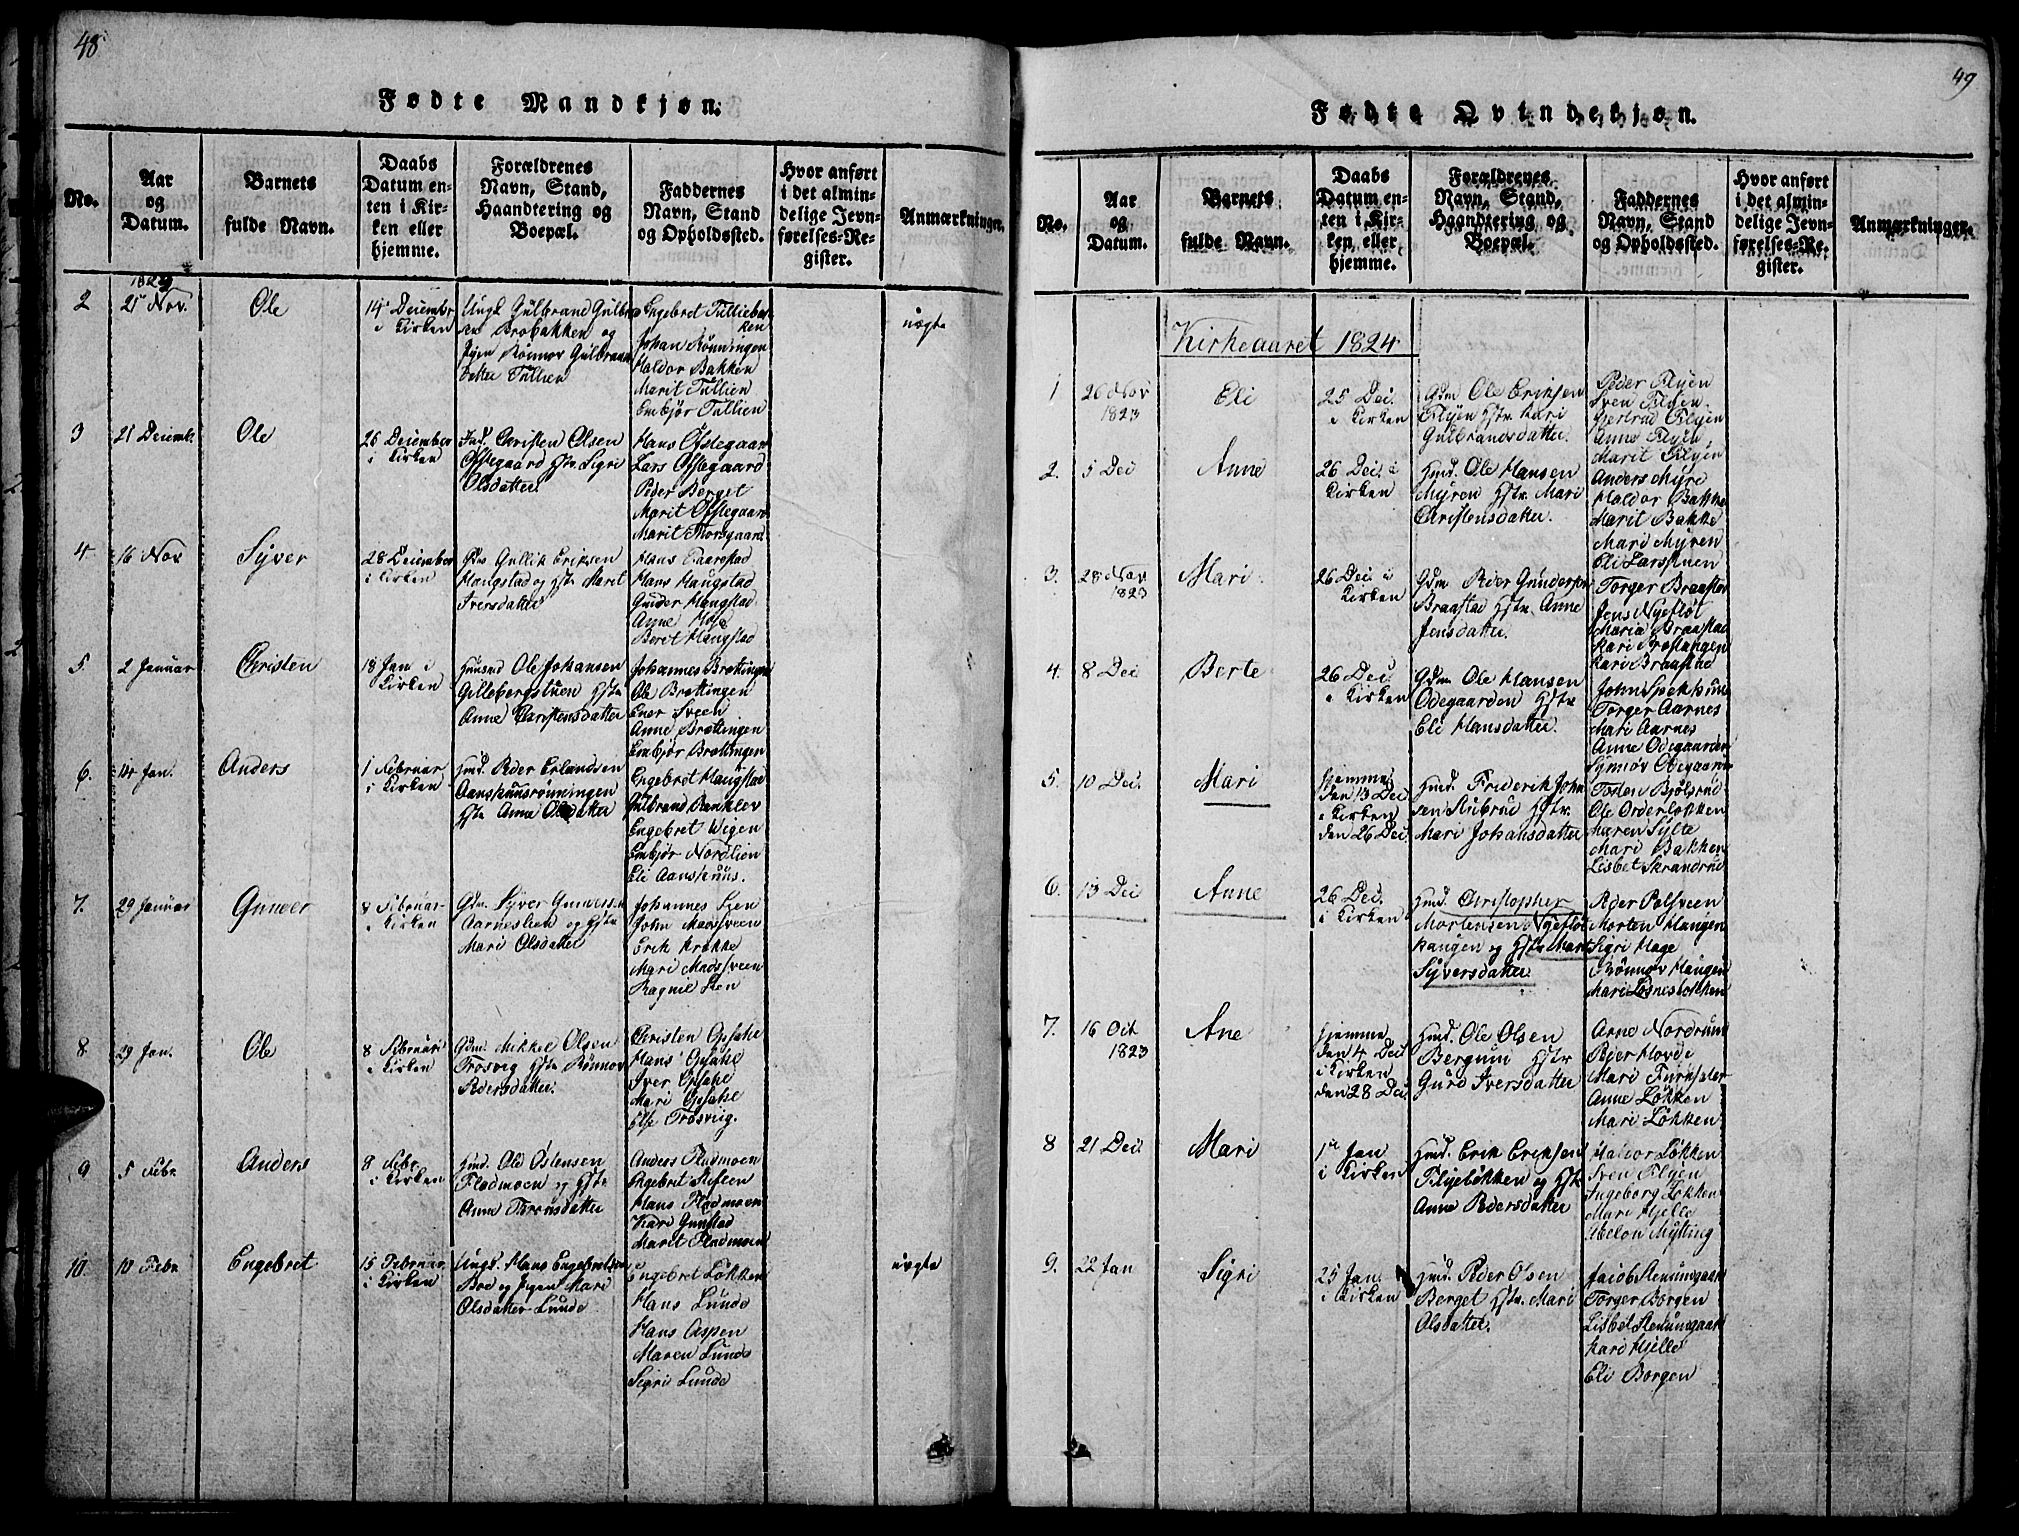 SAH, Ringebu prestekontor, Ministerialbok nr. 4, 1821-1839, s. 48-49